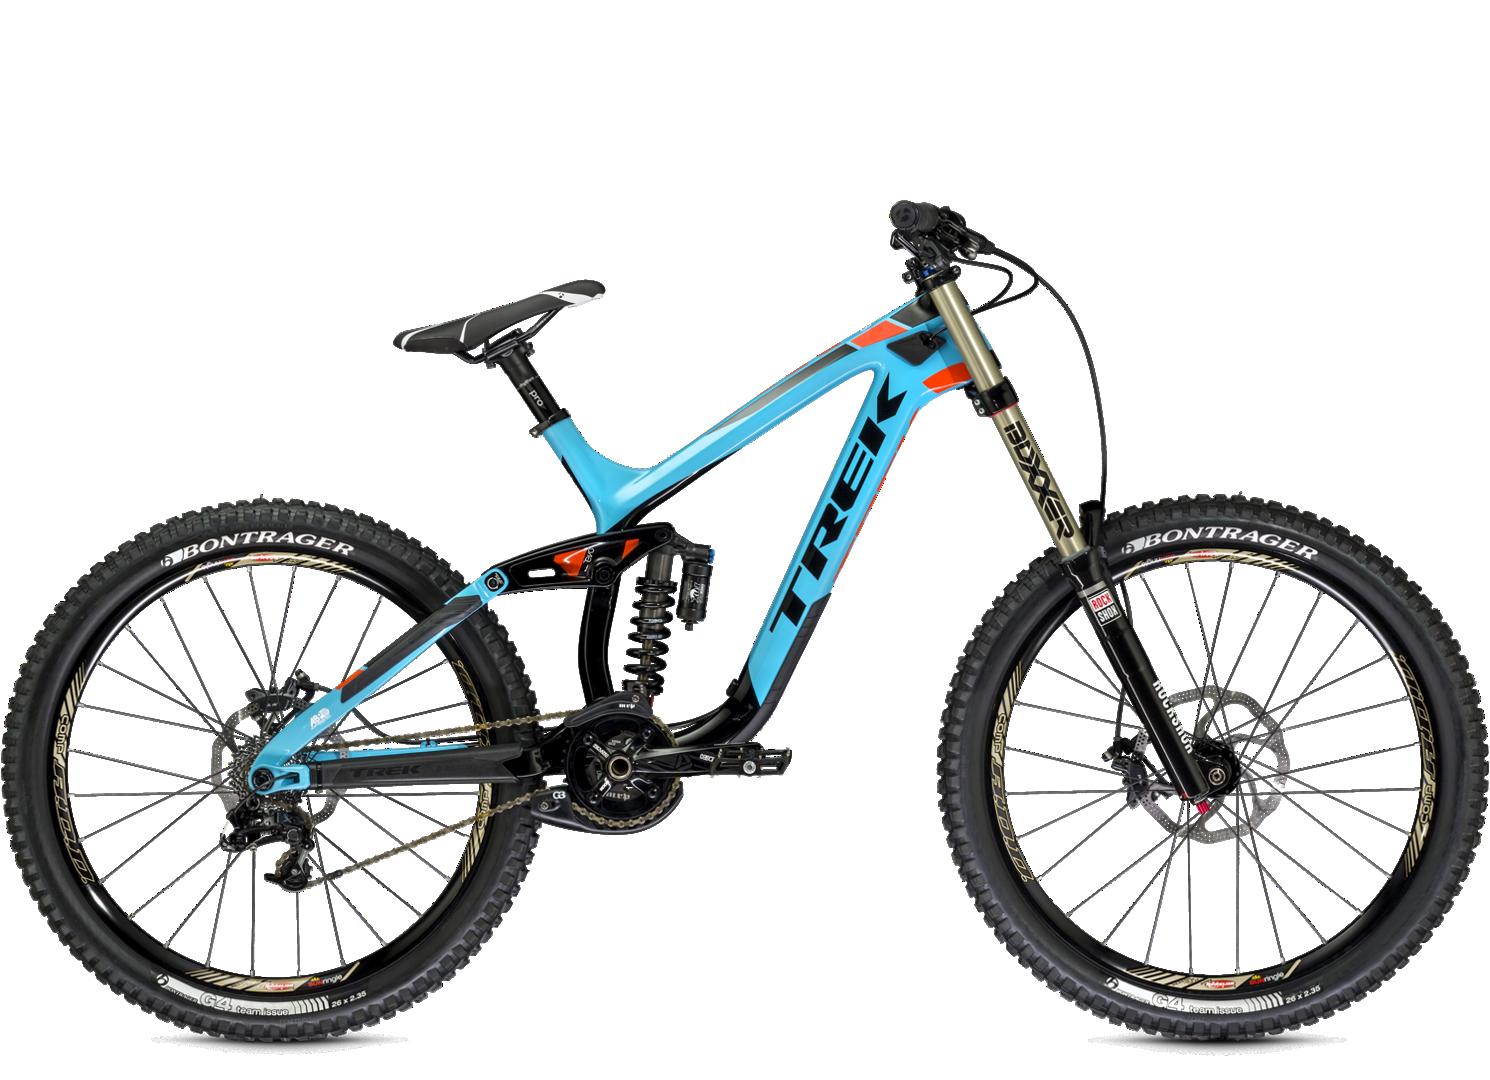 2014 Session 9.8 - Bike Archive - Trek Bicycle